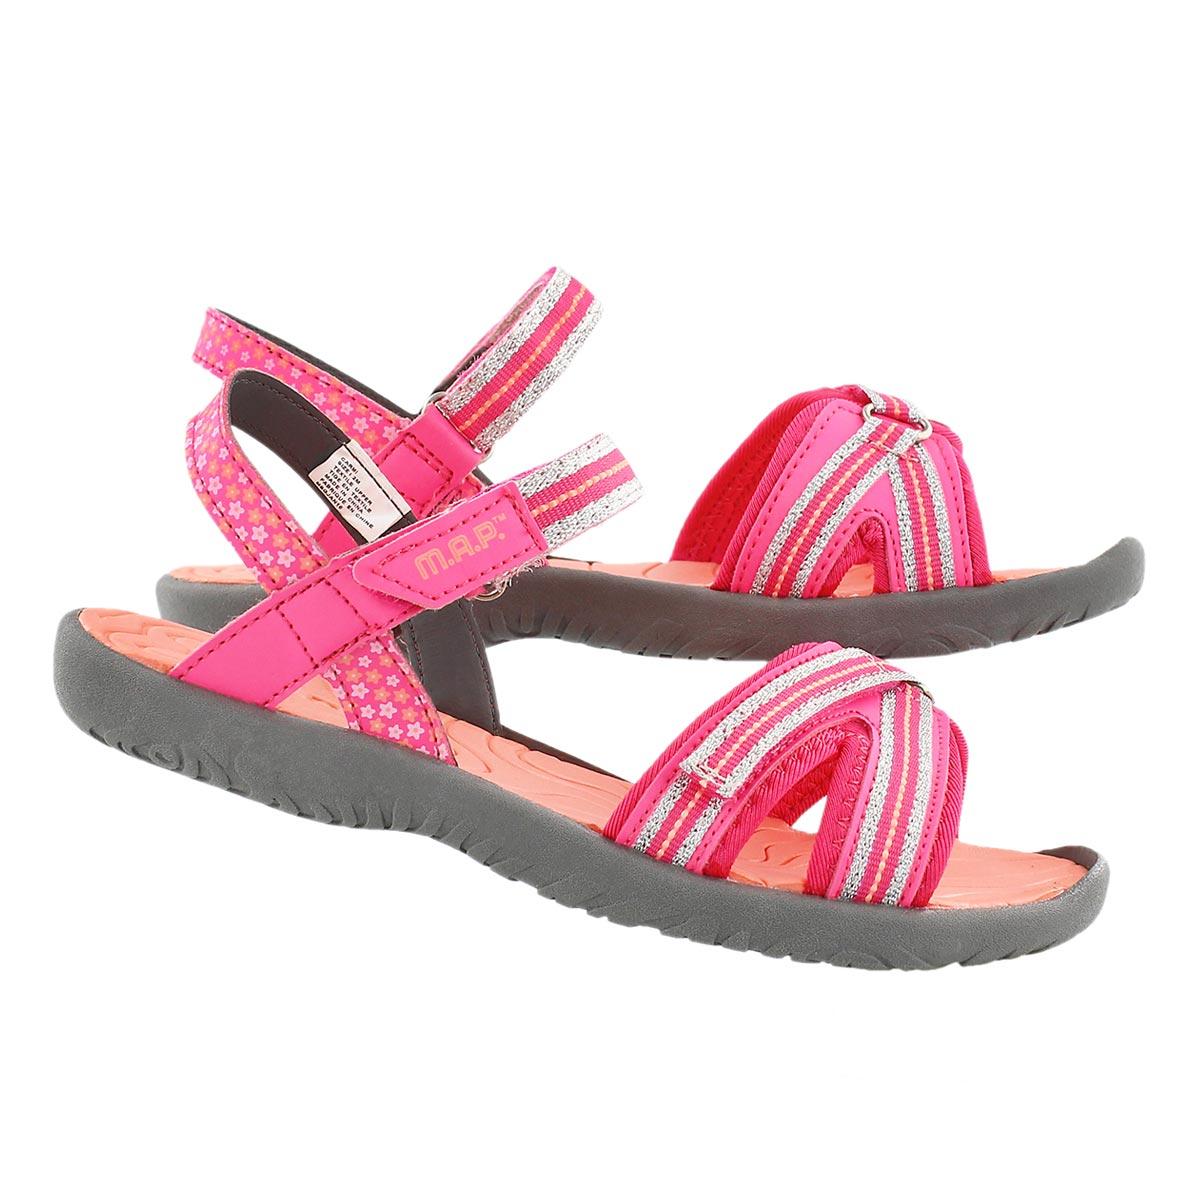 Sandale CARMI, rose/corail, filles